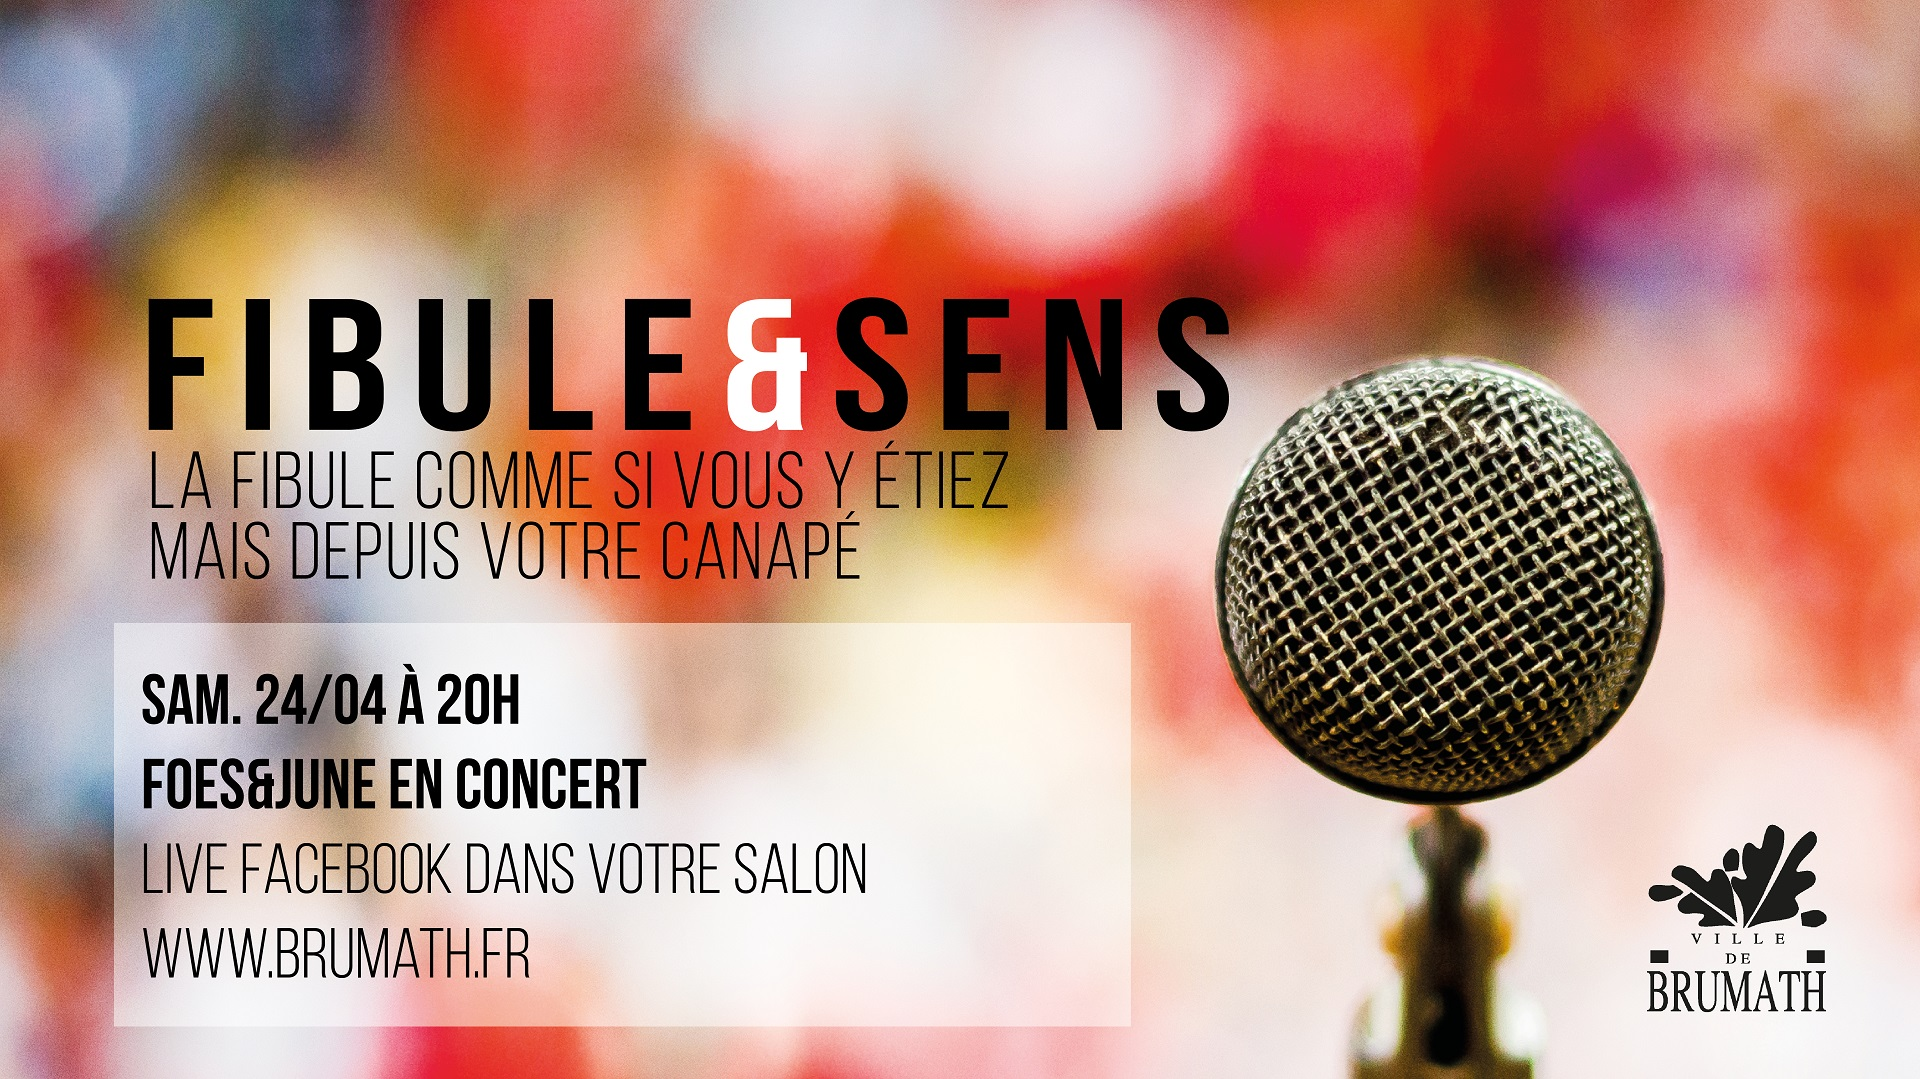 Fibule&sens : Foe&June en concert